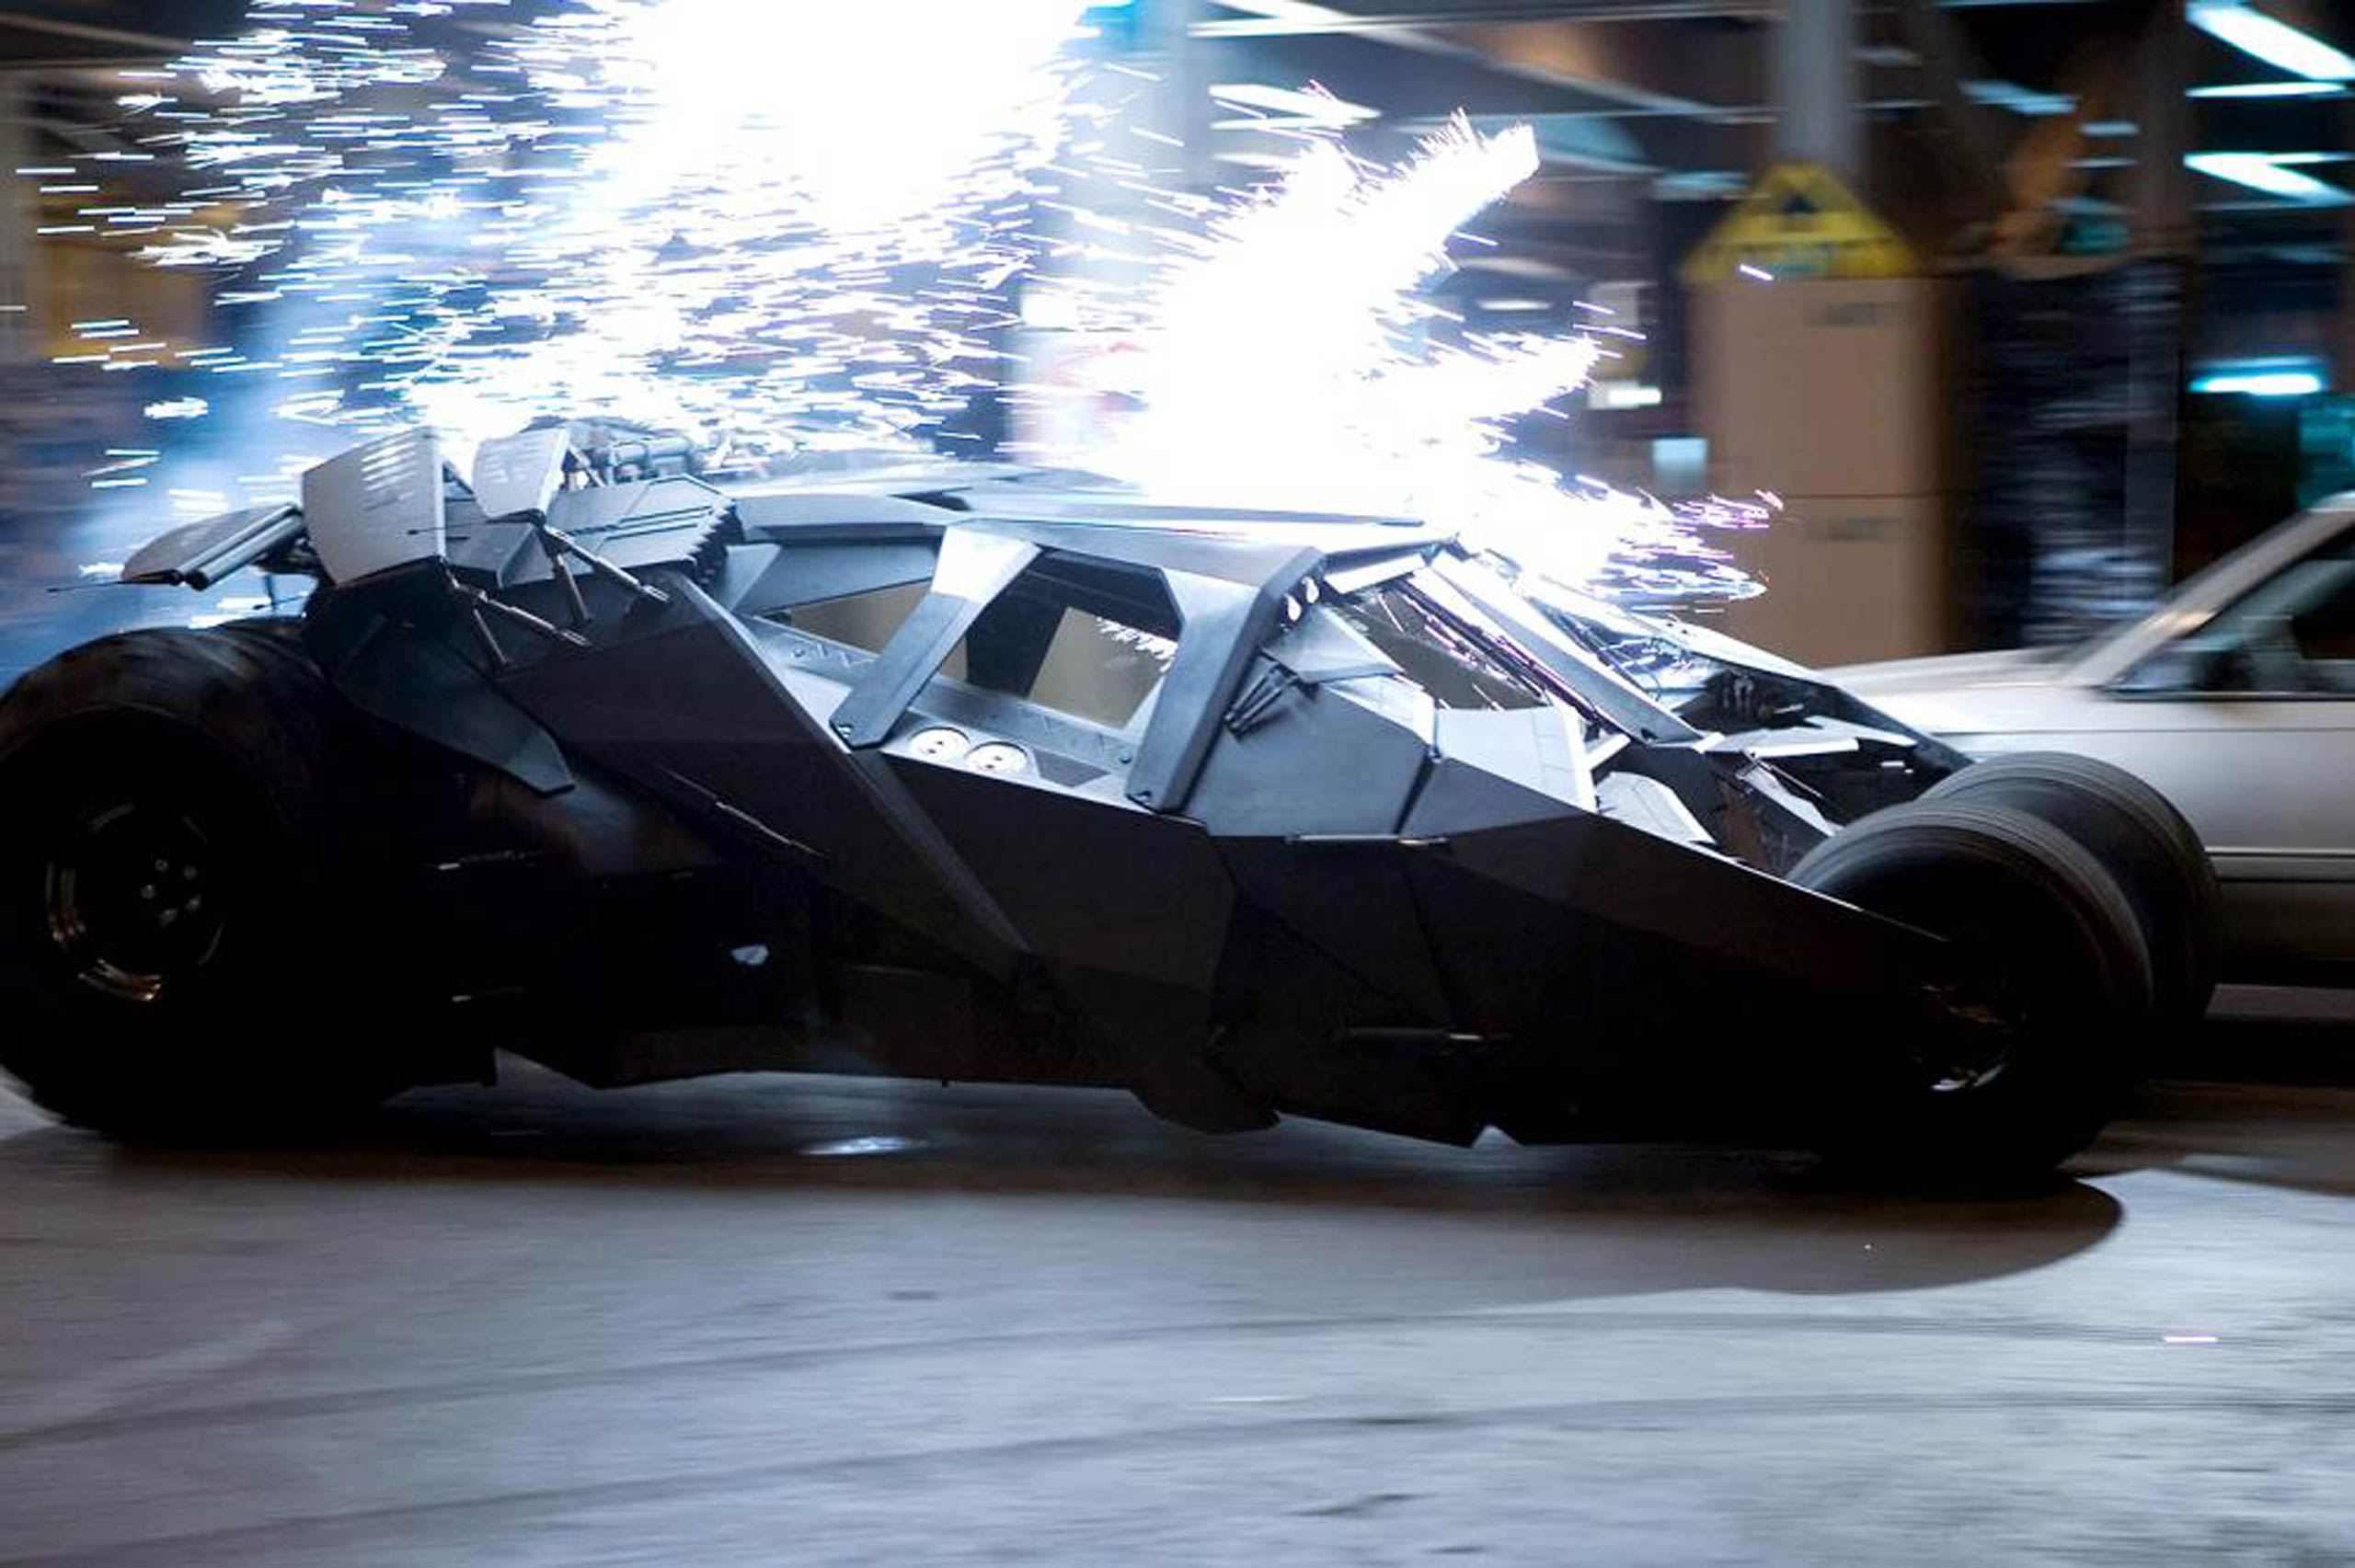 Batman Begins, The Dark Knight, The Dark Knight Rises